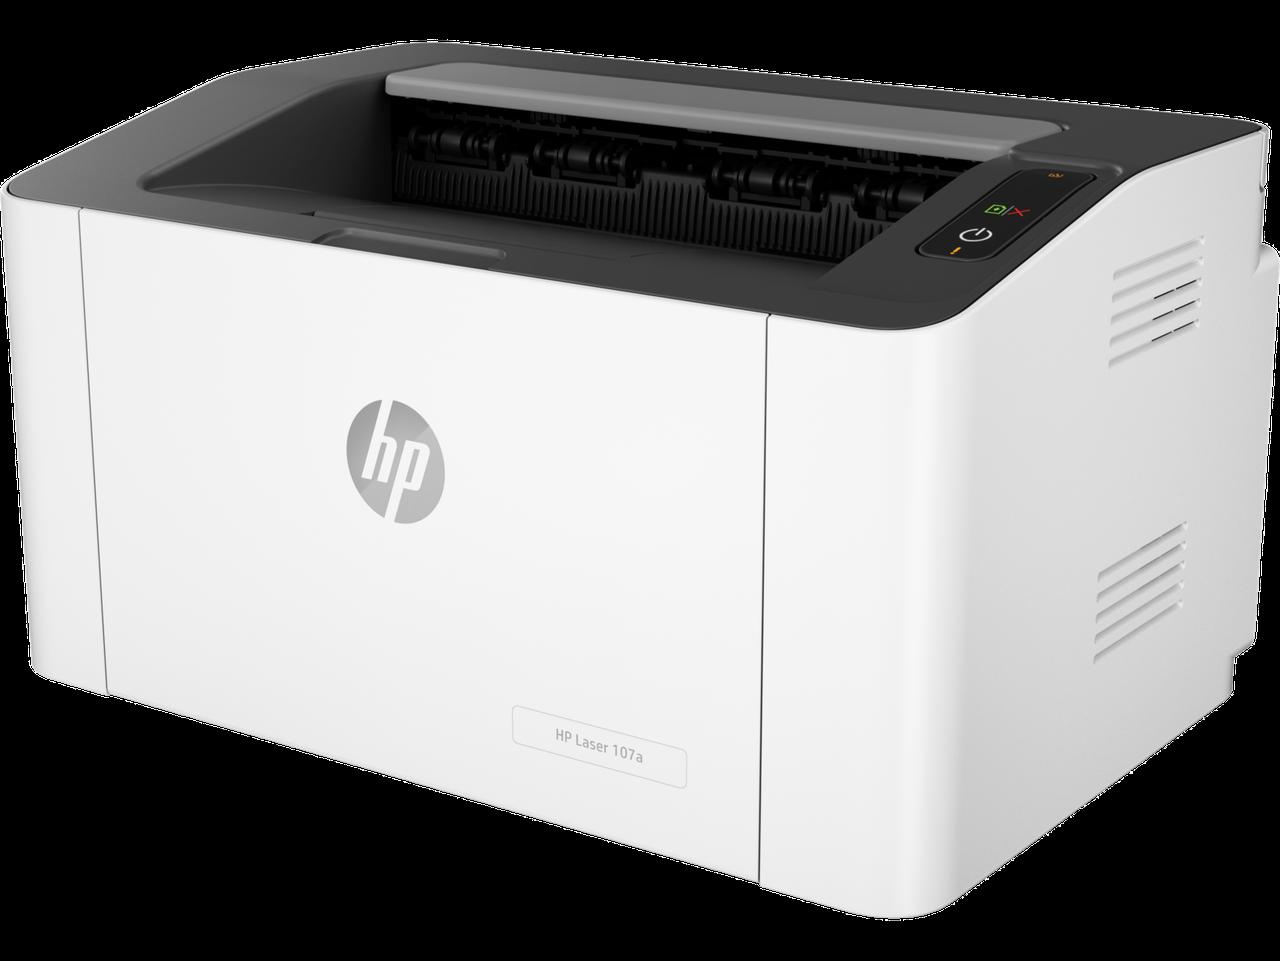 HP 4ZB77A Принтер лазерный черно-белый Laser 107a (A4) 1200 dpi, 20 ppm, 64 MB, 400 MHz, 150 pages tray, USB